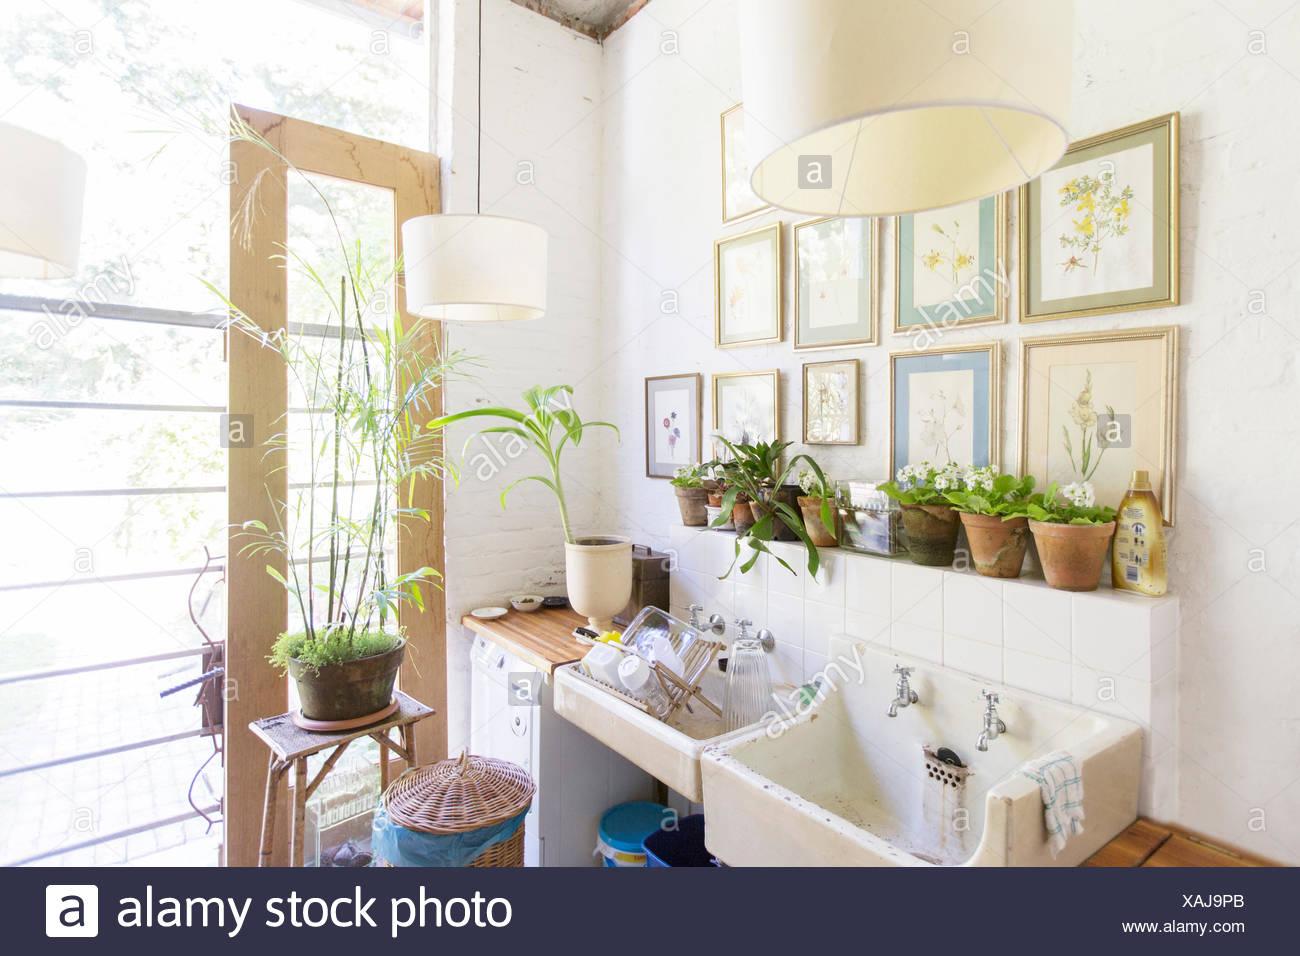 Tapices de Pared y luces por fregadero rústica Imagen De Stock